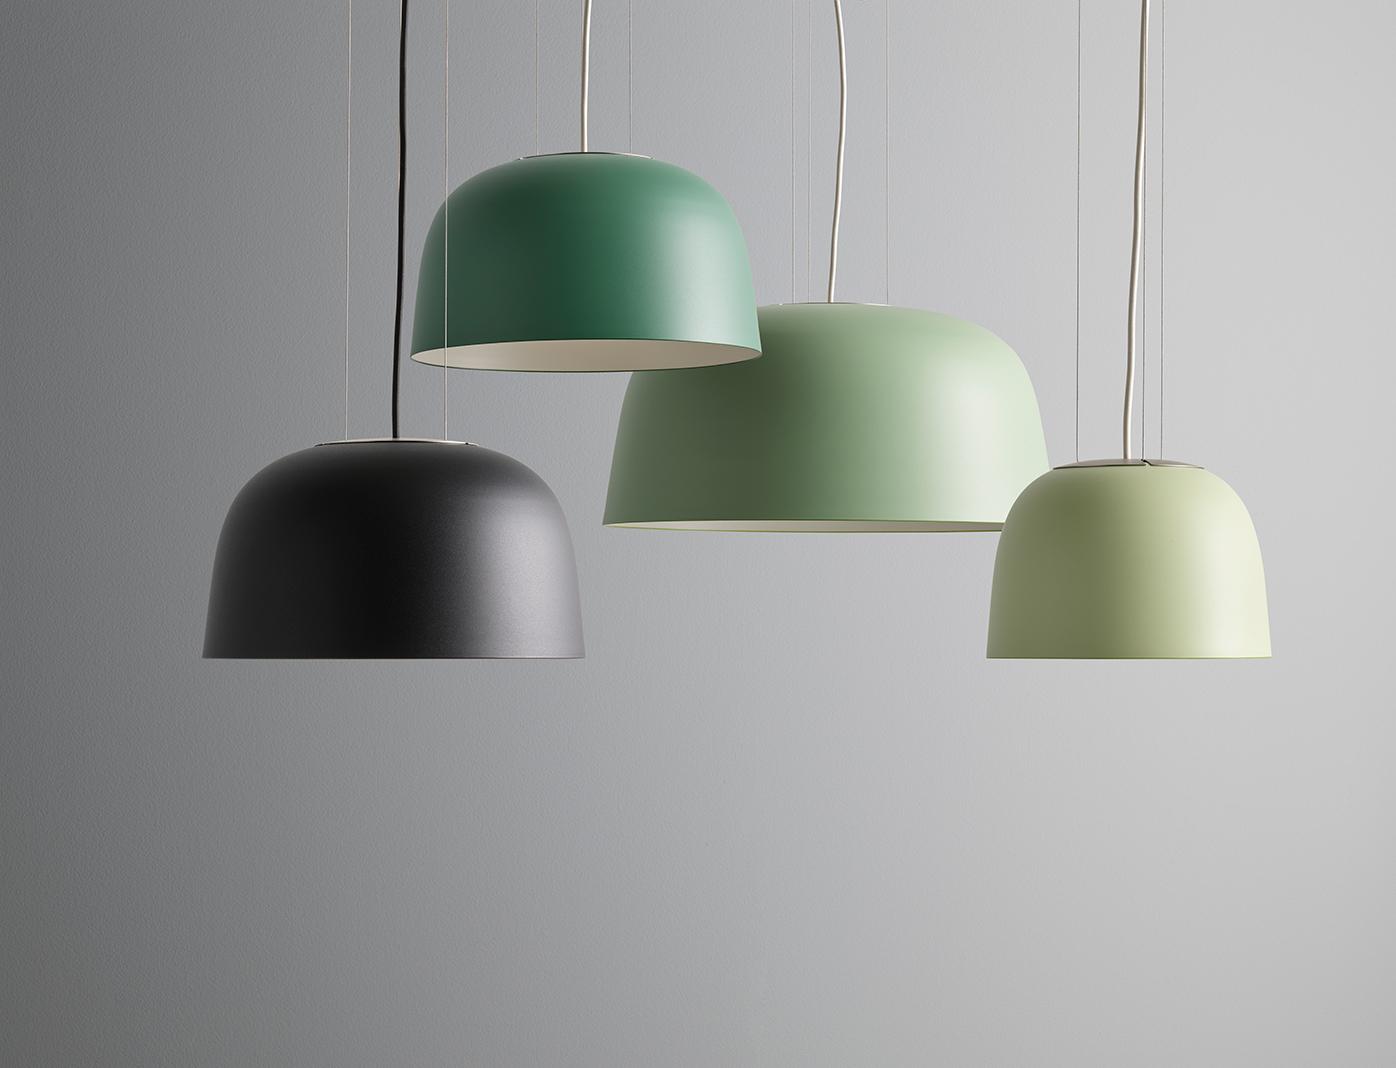 nordic-collection_sva-colors_johan-holmquist